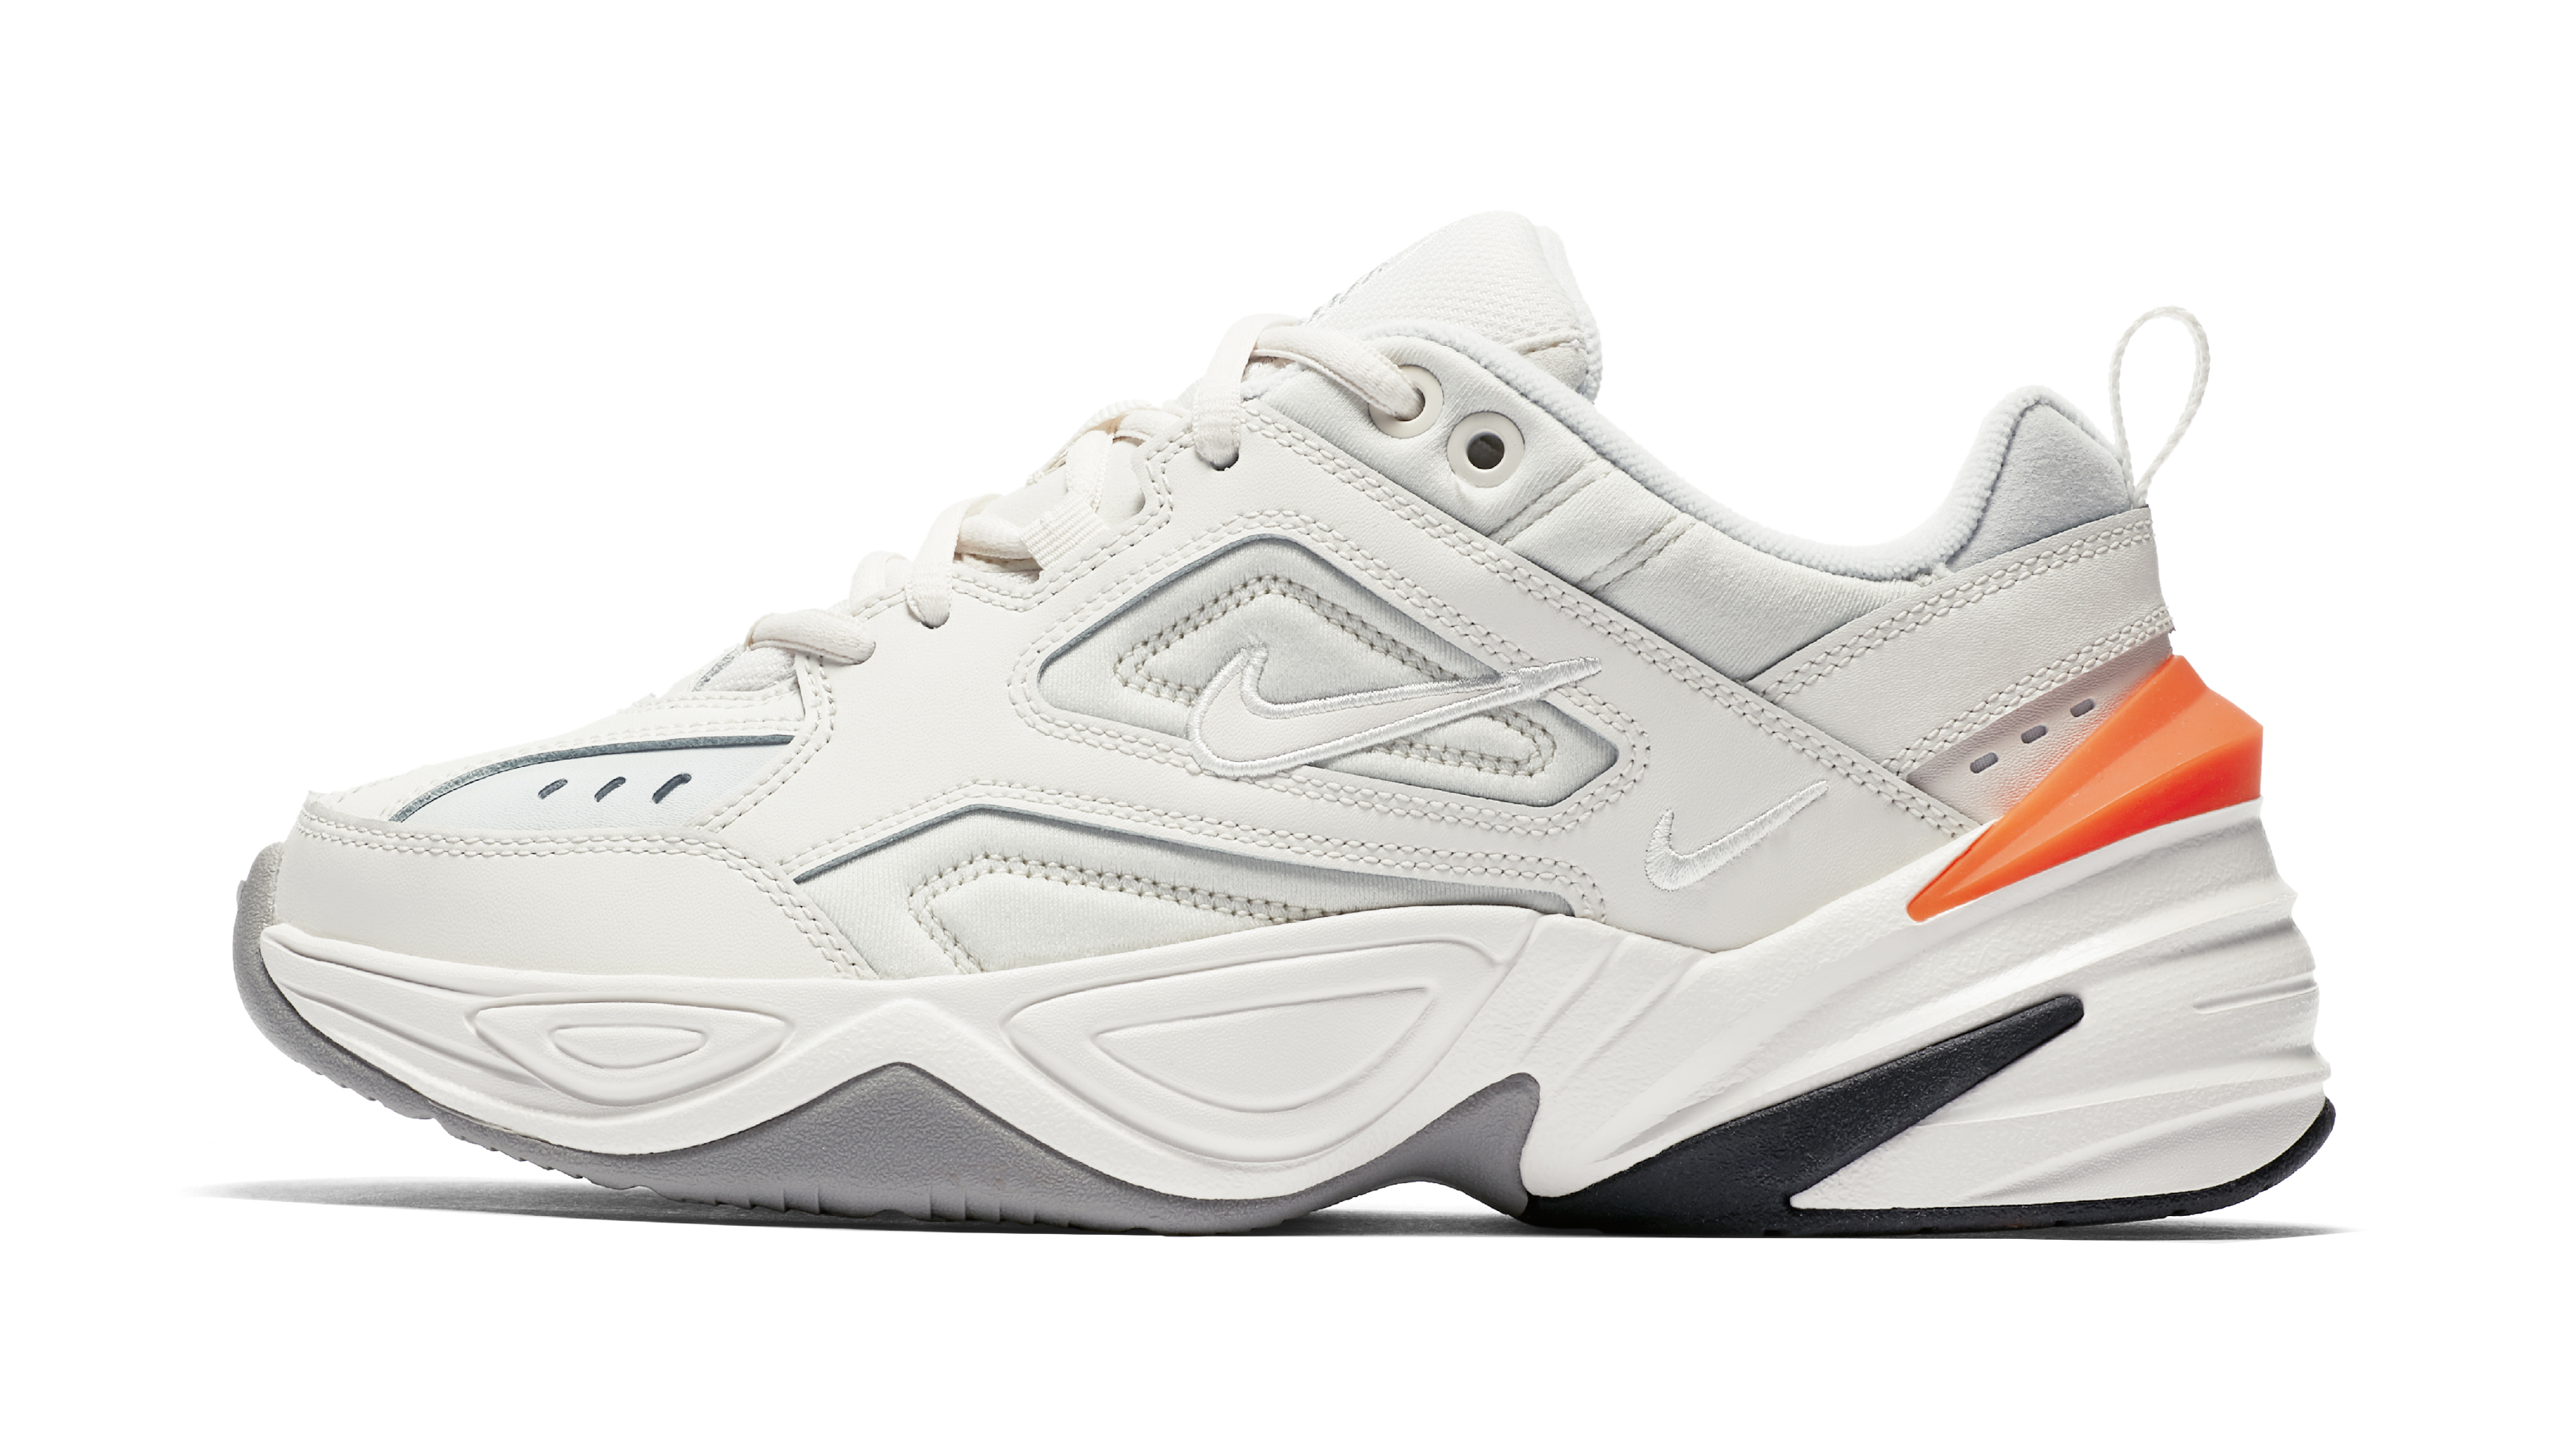 Nike M2K Tekno release date